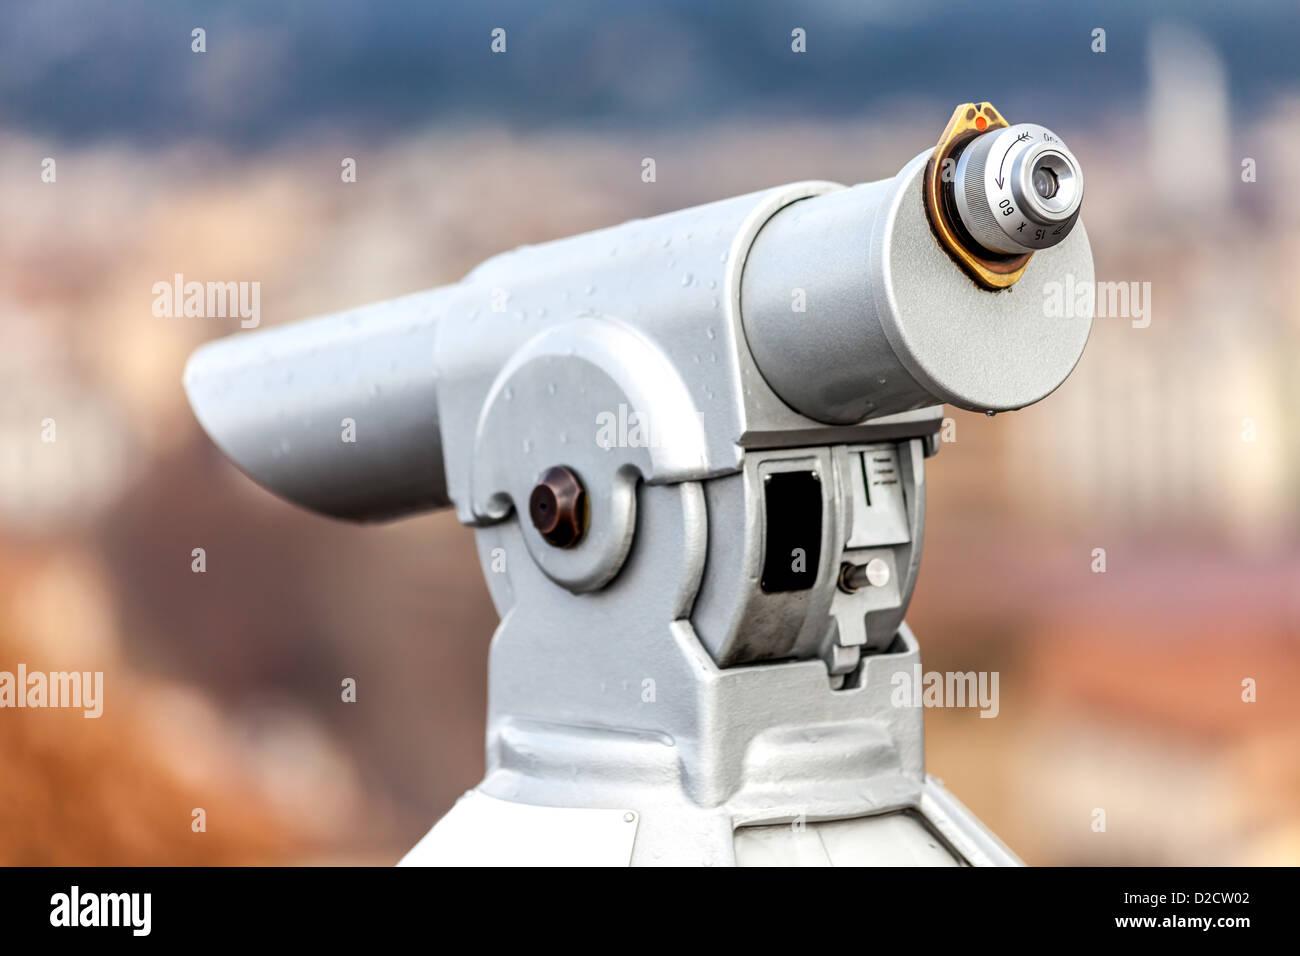 Coin Telescope - Stock Image